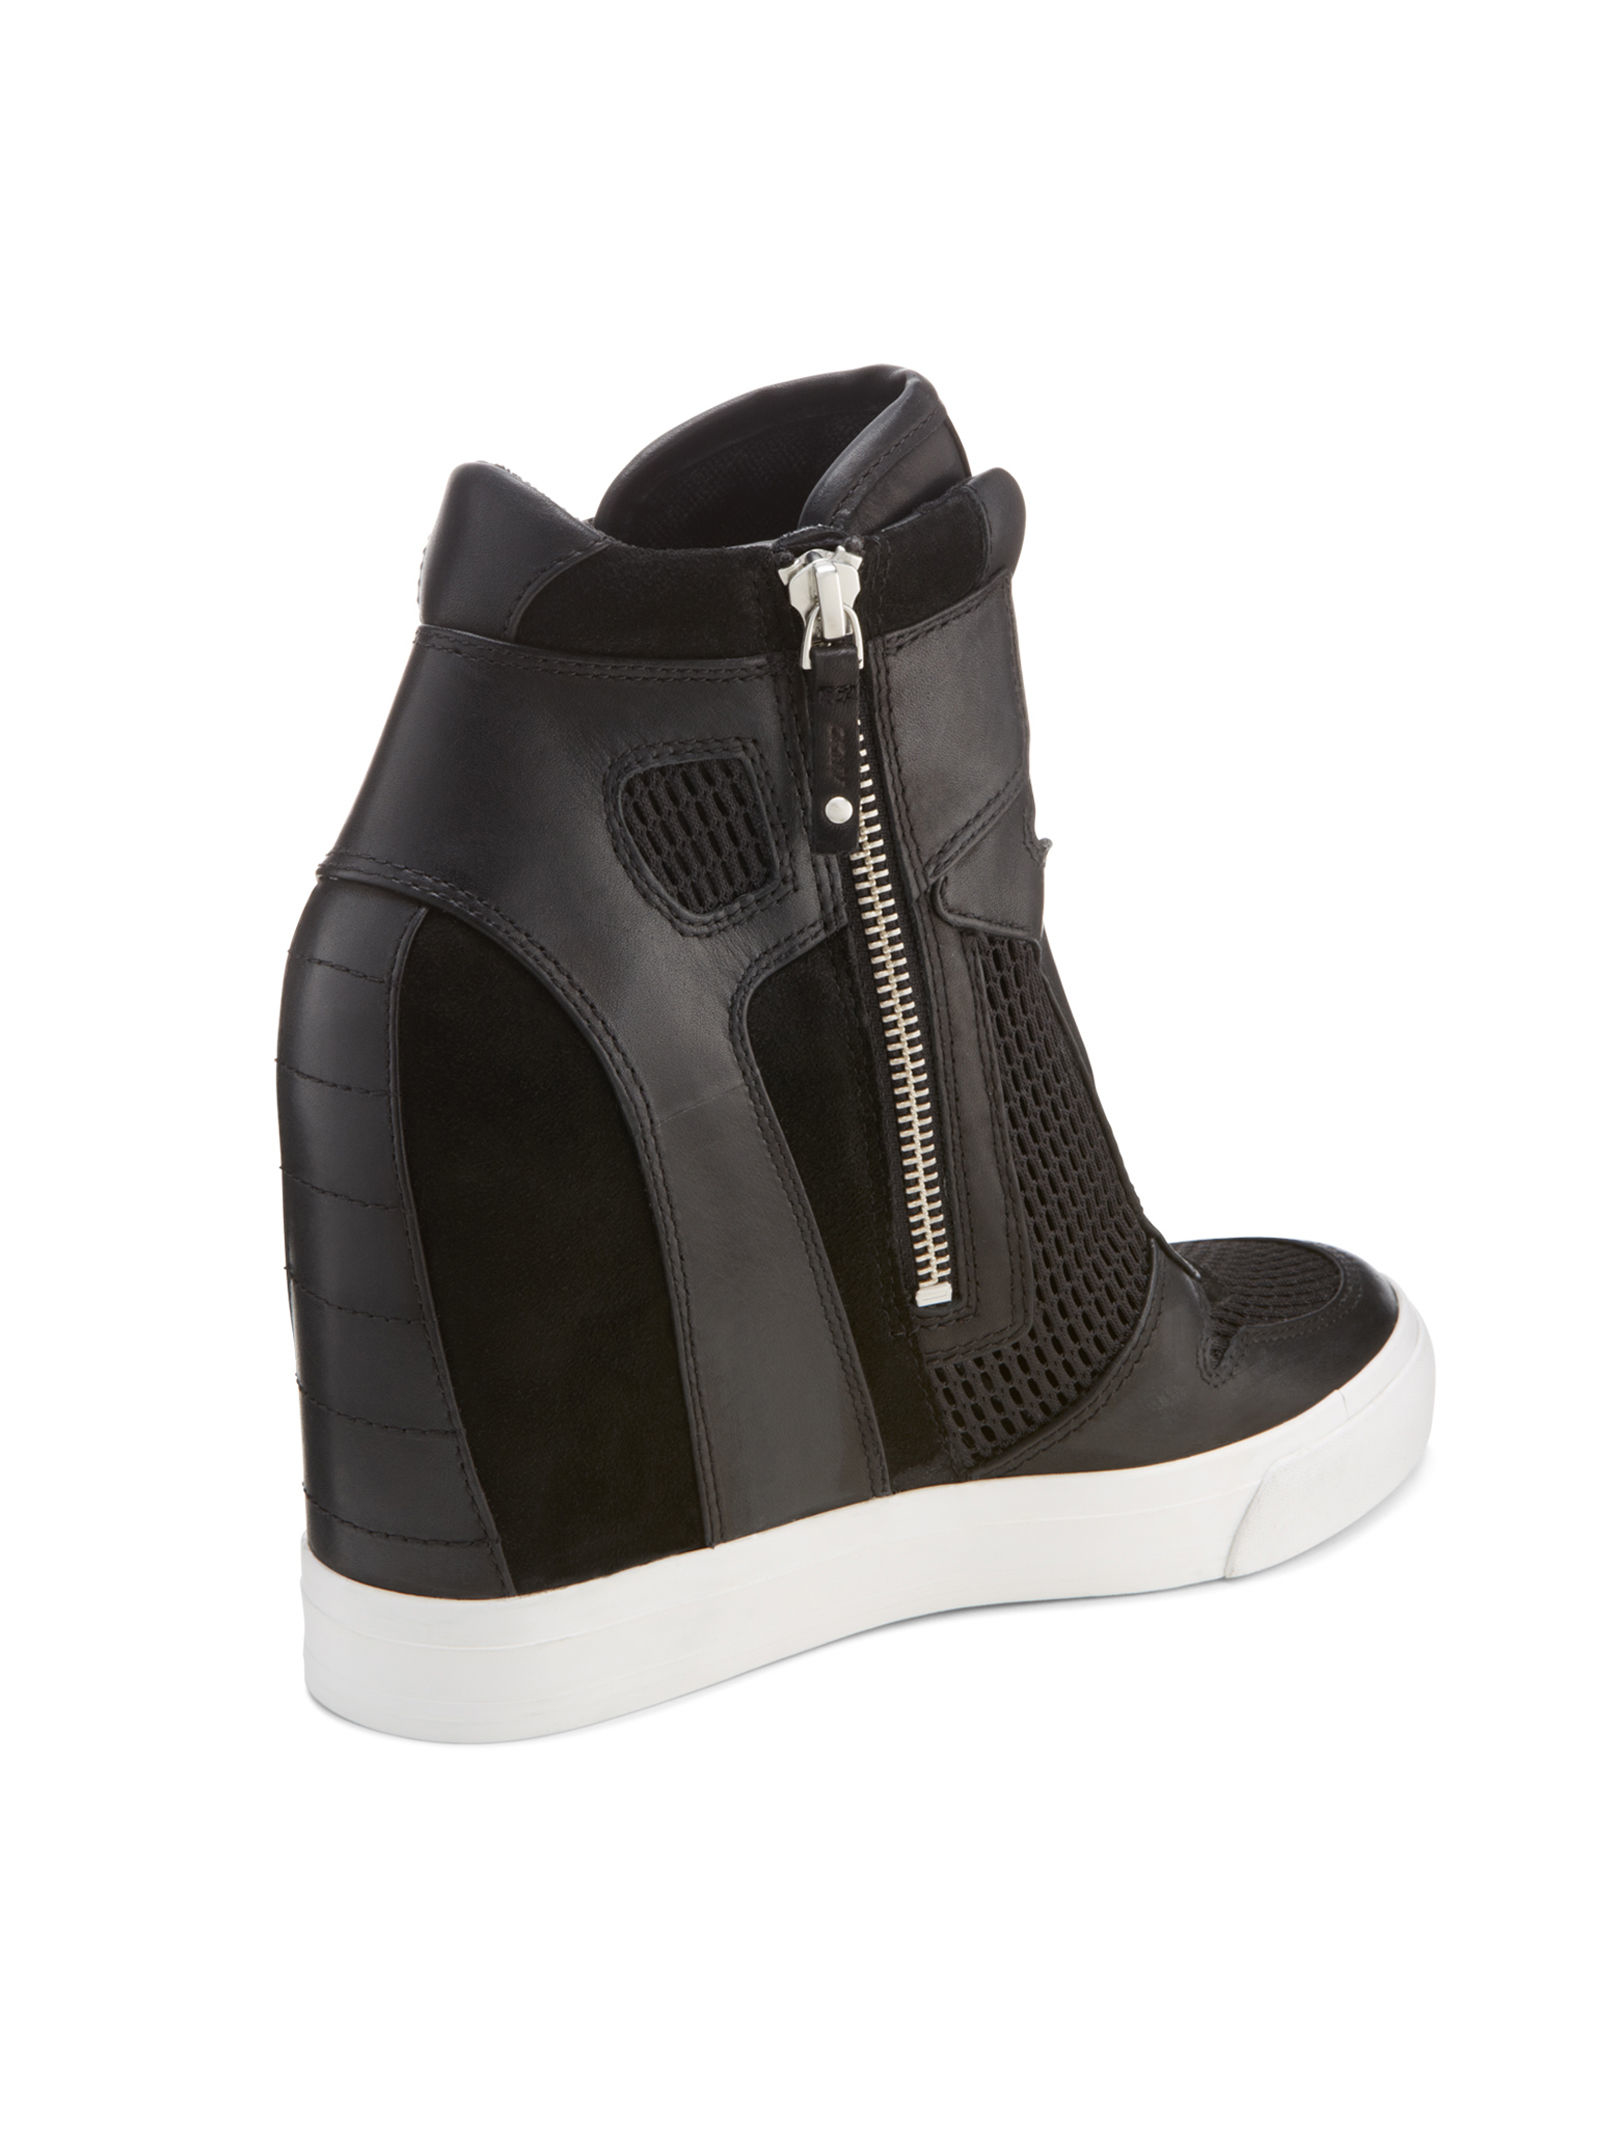 9e7d58bd5386 Lyst - DKNY Grand Wedge Sneaker in Black